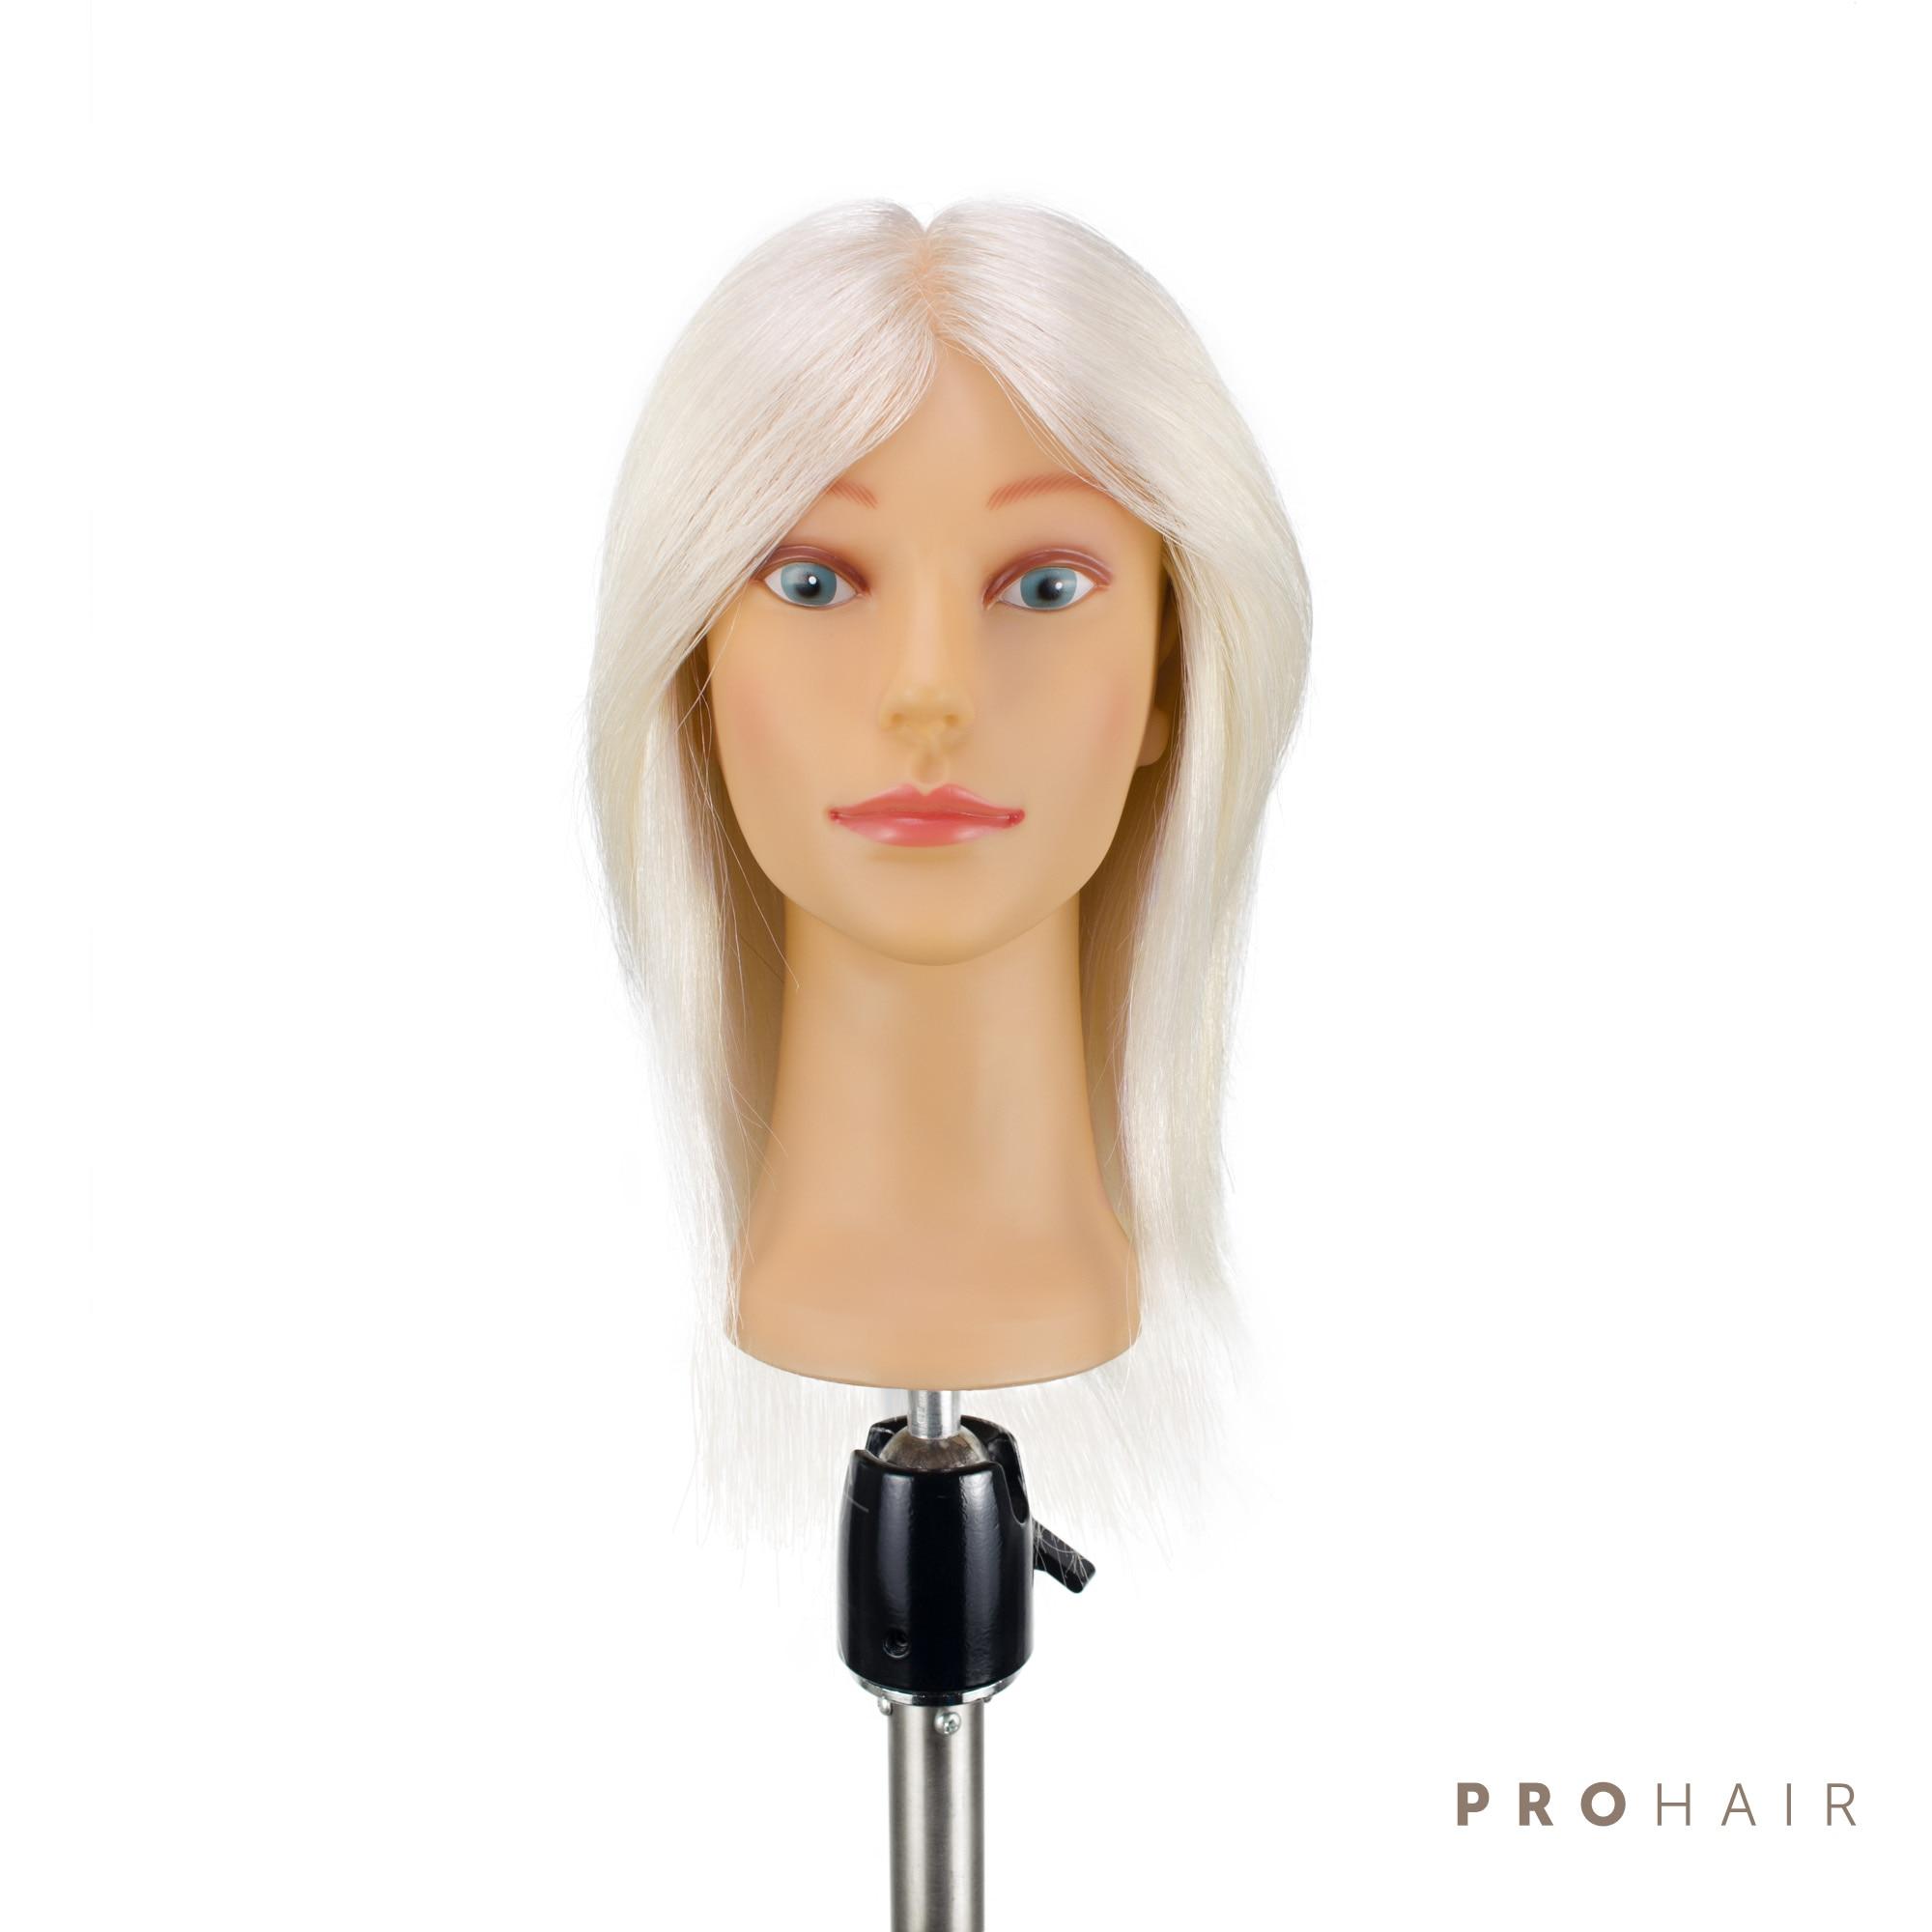 PROHAIR 30CM 12 100 Goat Hair White MINI Training Head Salon Female Mannequin Head Hairdressing Practice